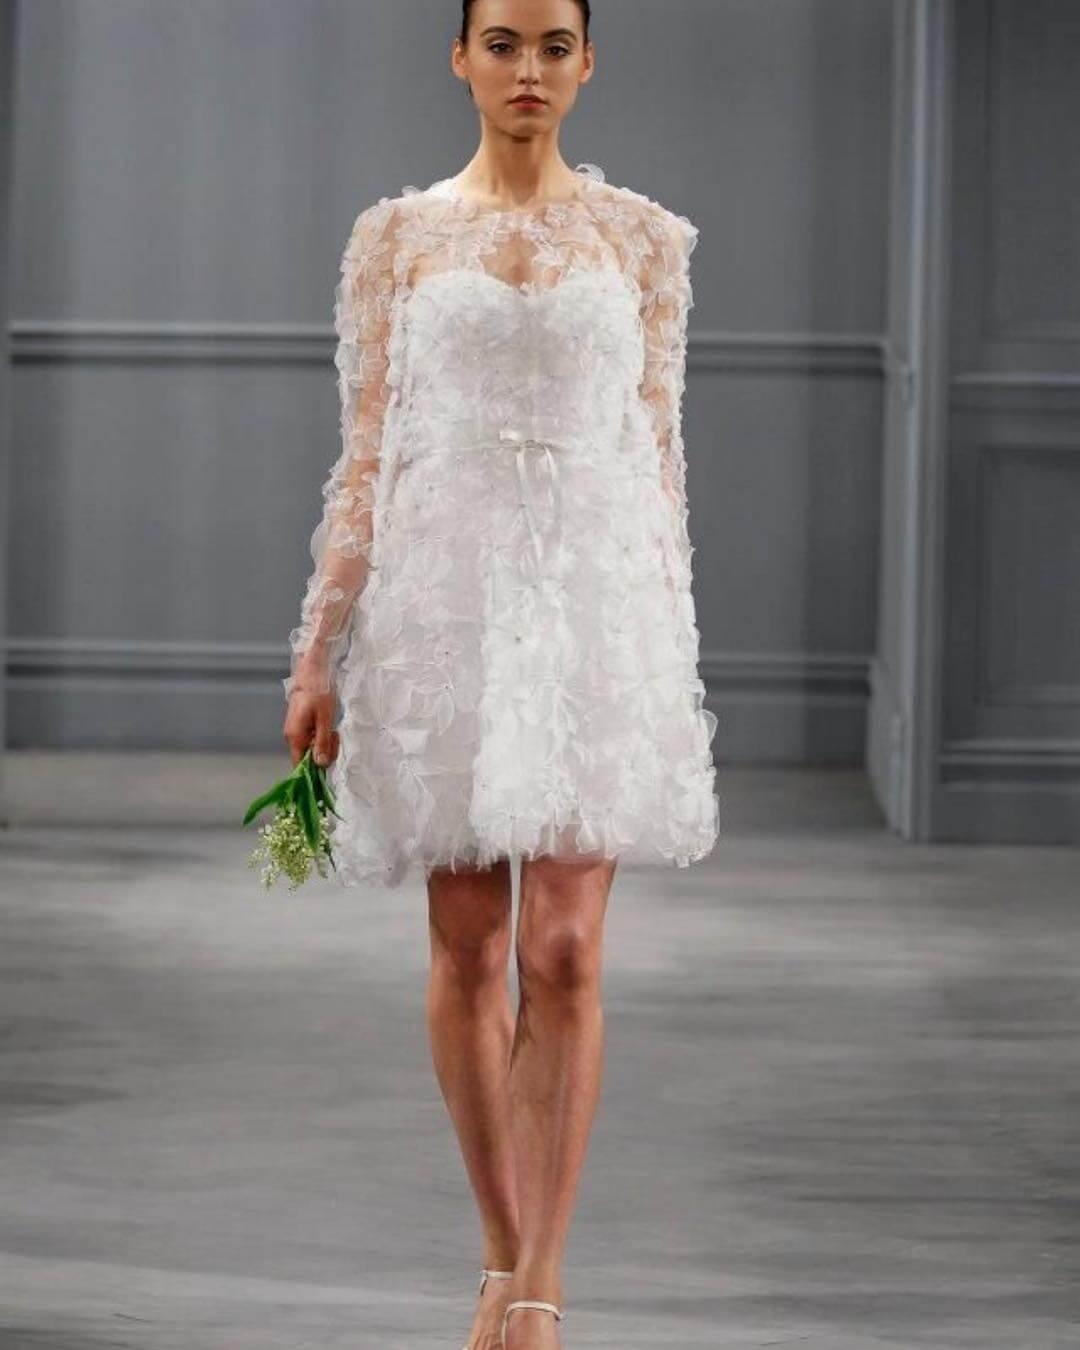 vestido de novia corto moderno con transparencias